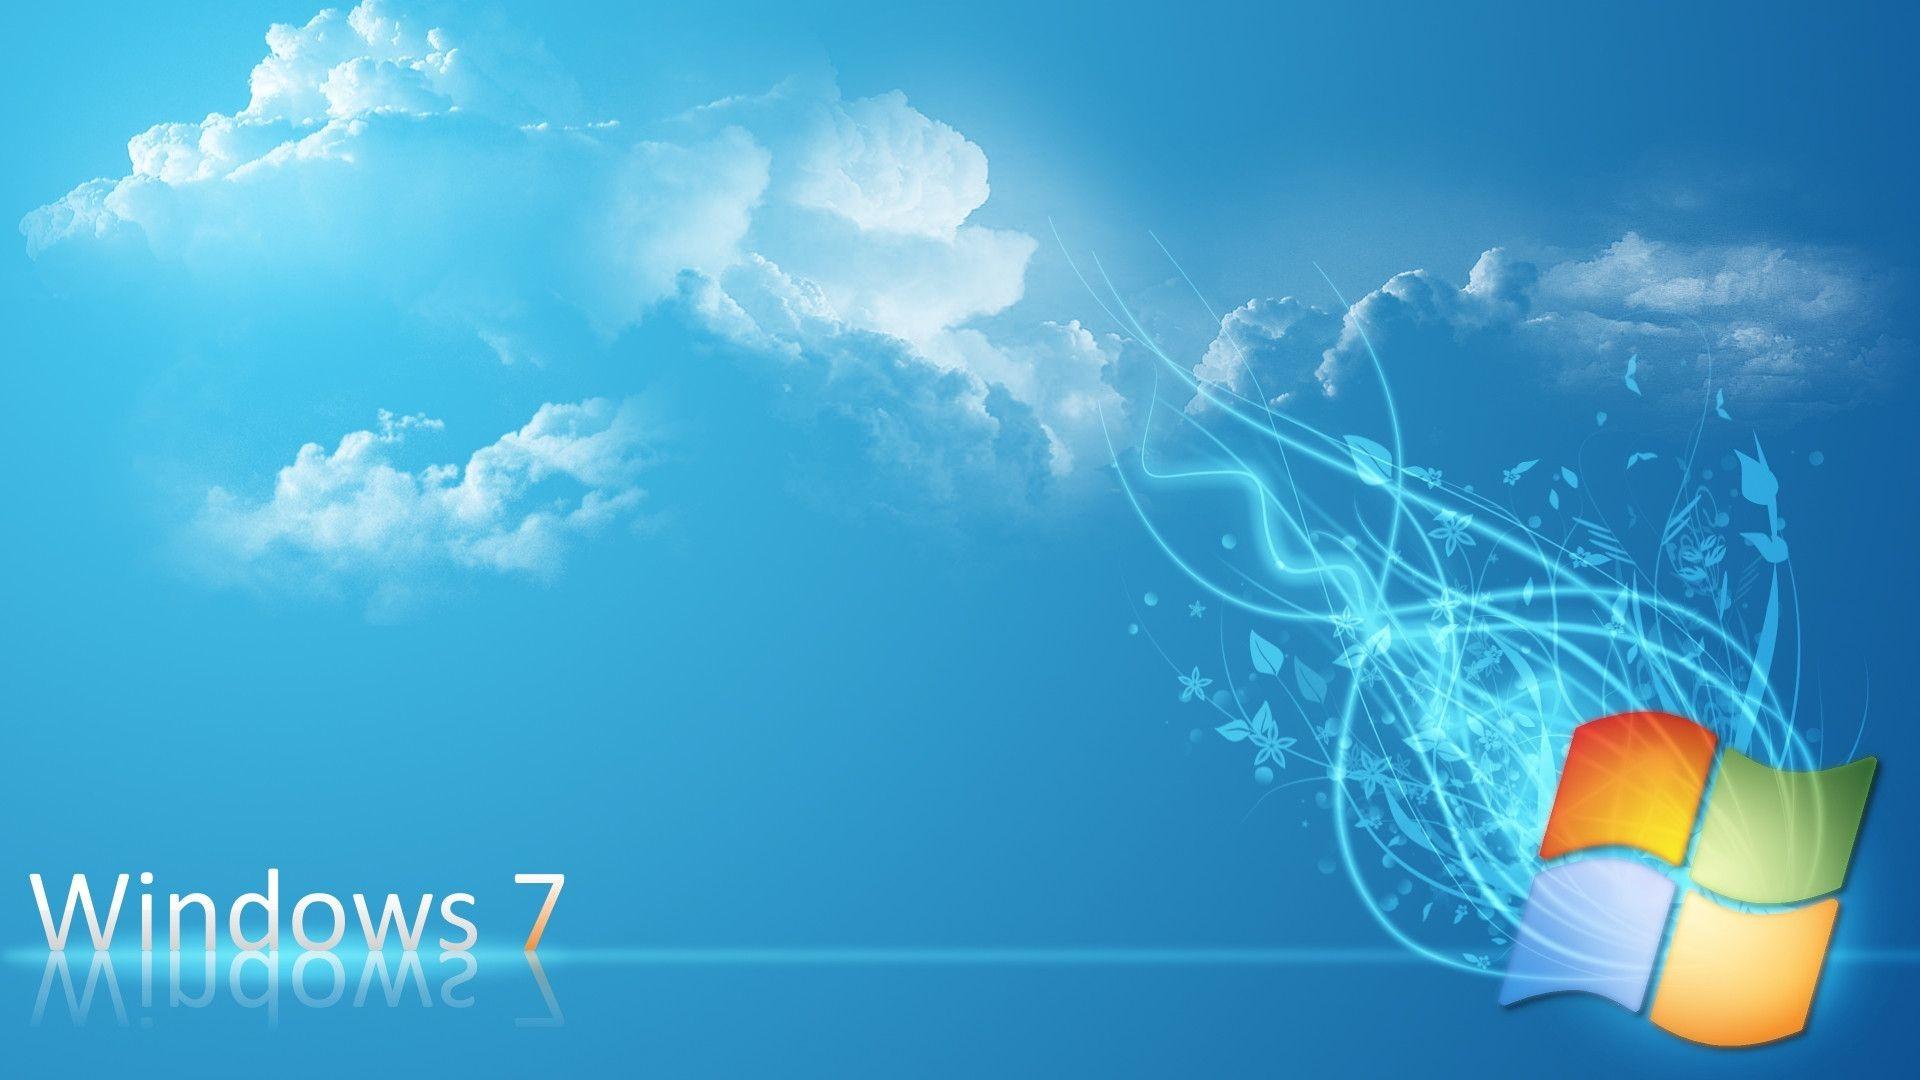 Windows 7 Hd Wallpaper ①